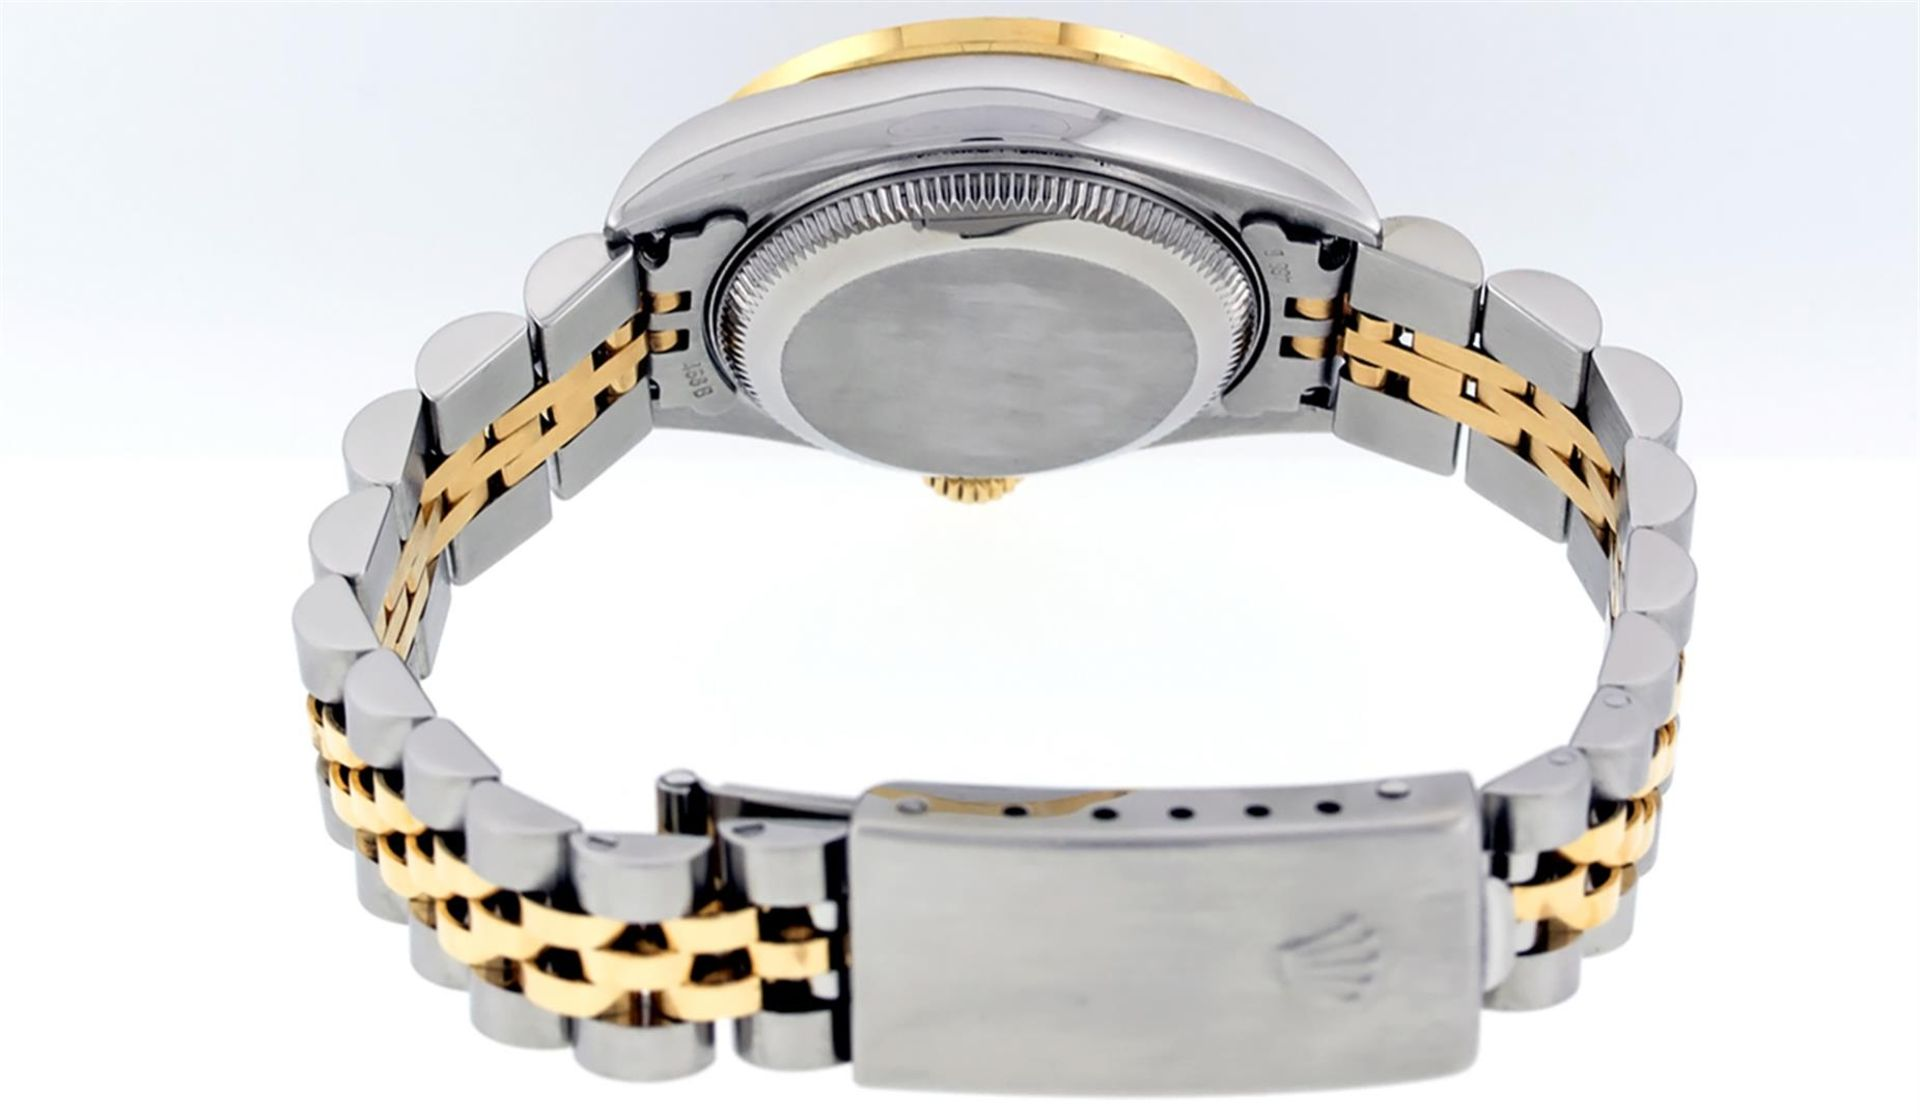 Rolex Ladies 2 Tone 18K Champagne String Diamond Lugs Datejust Wristwatch - Image 5 of 7